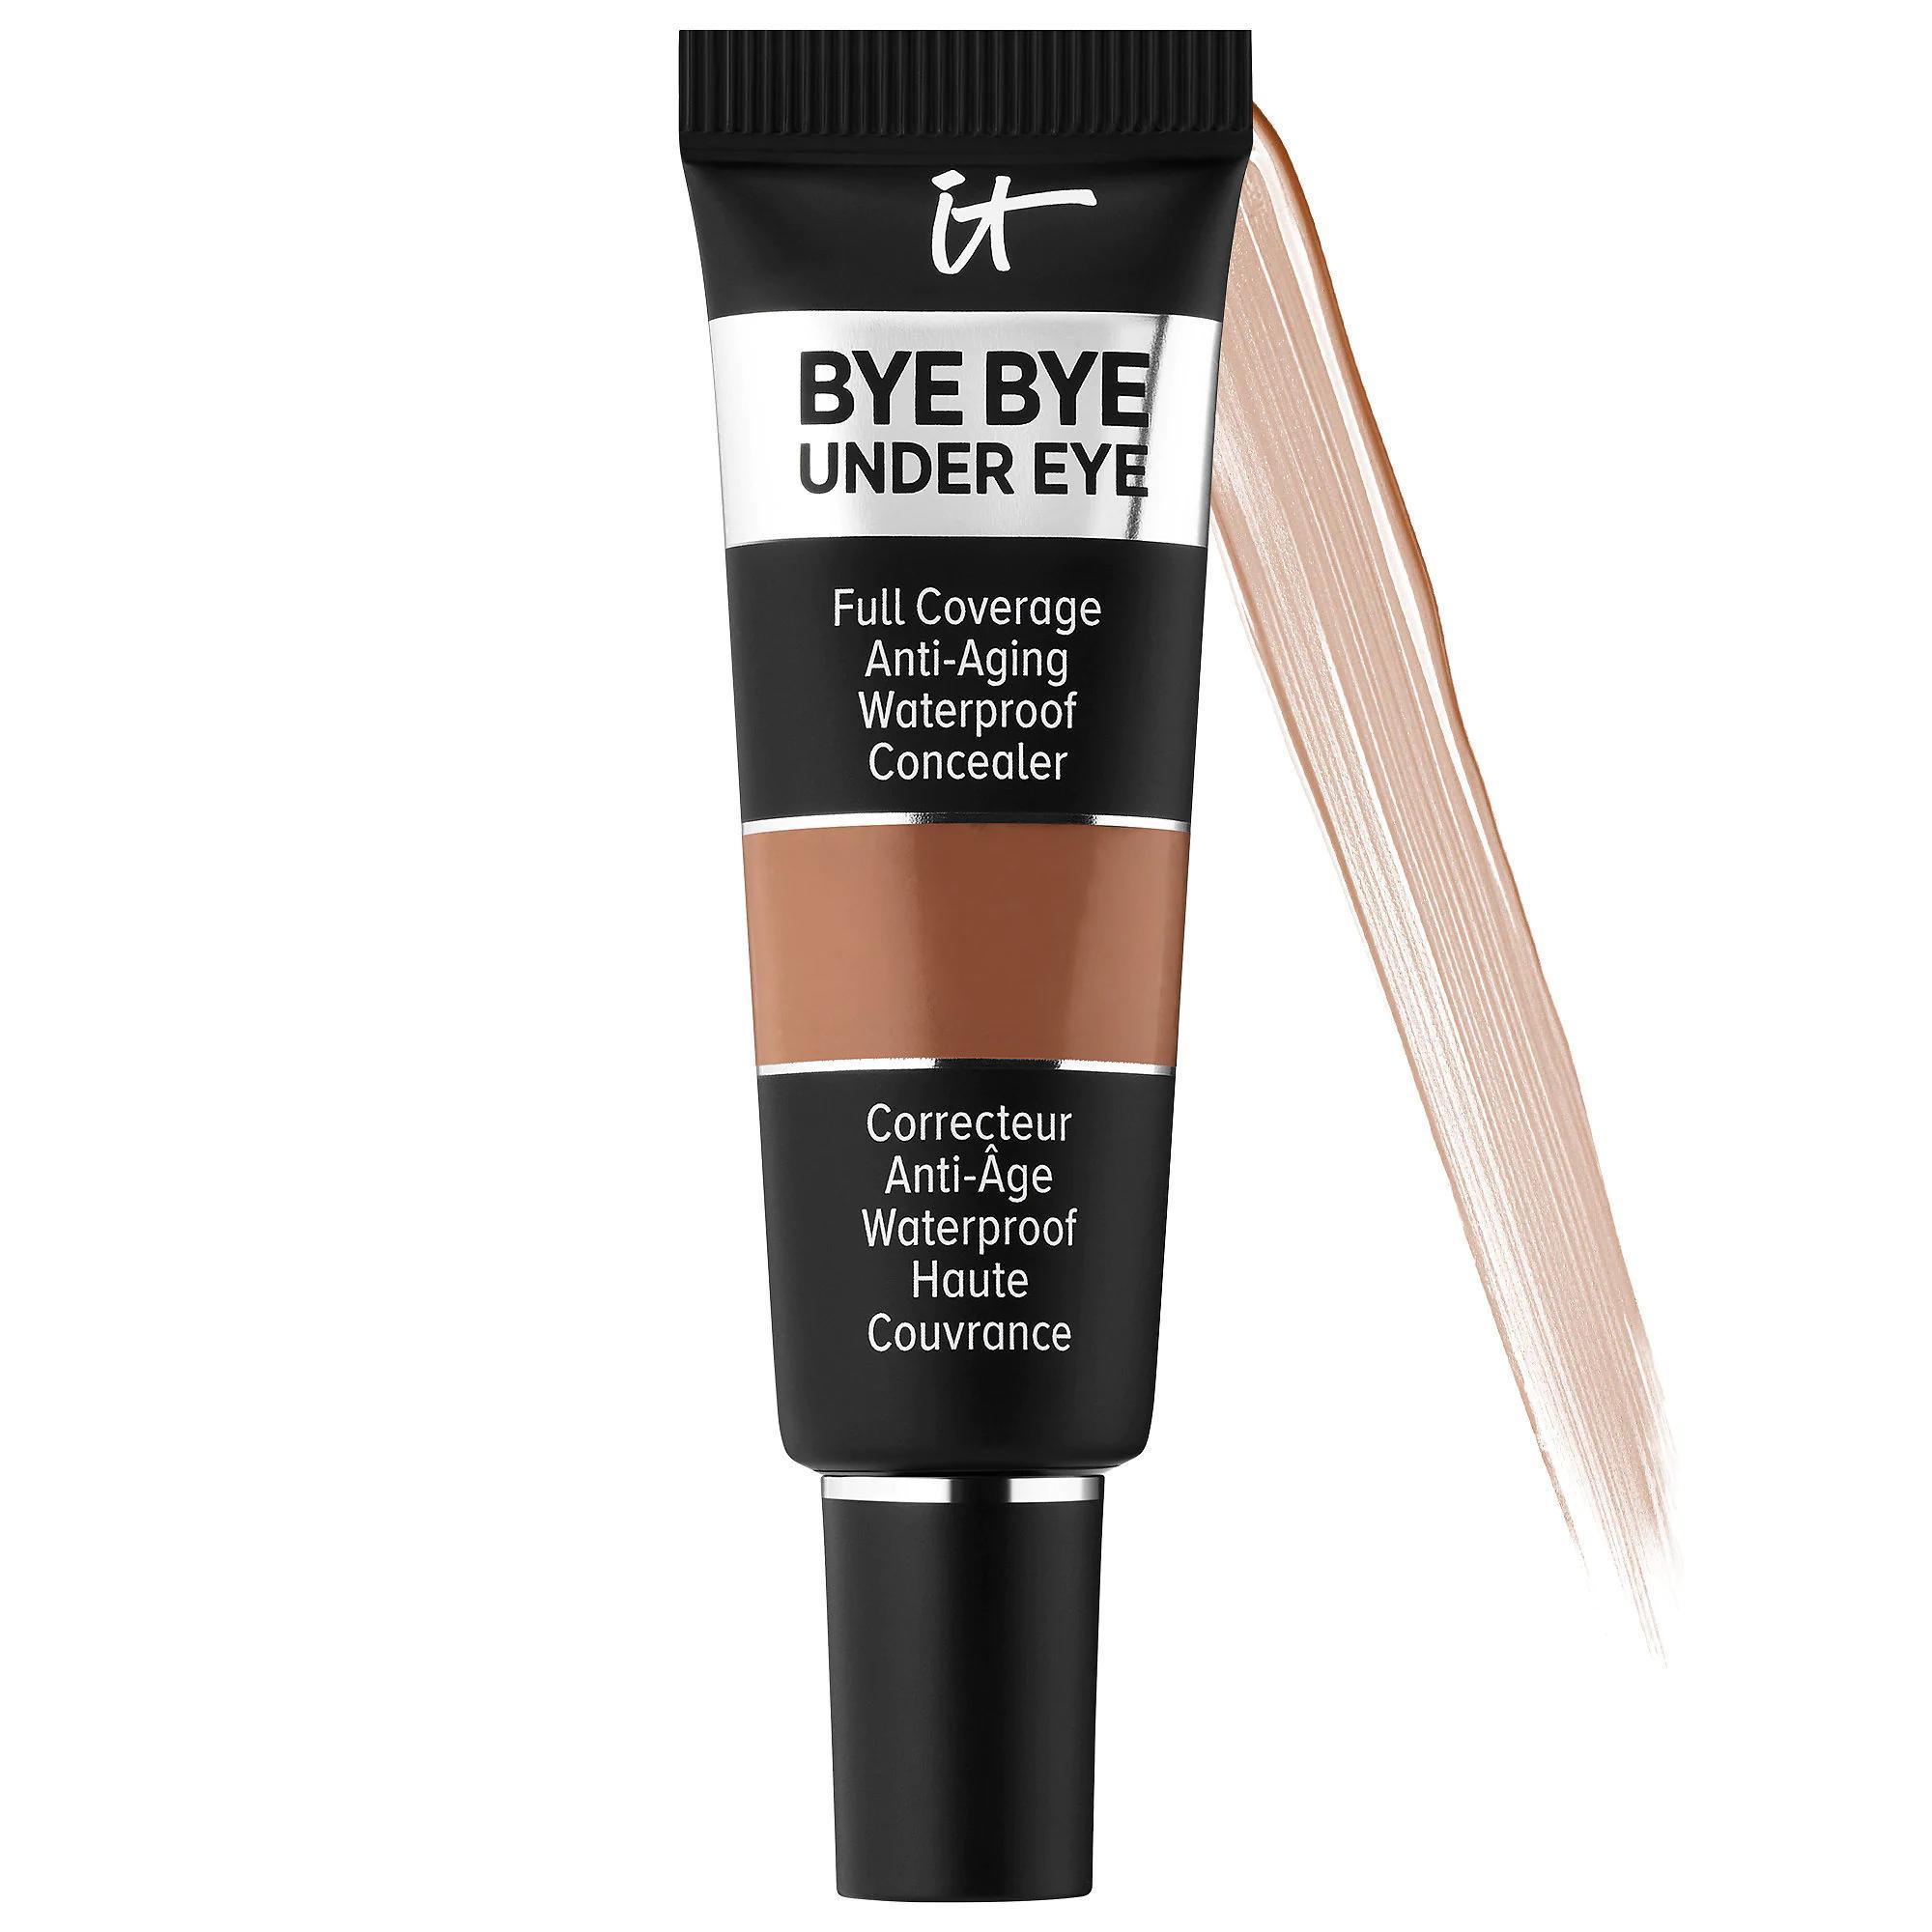 IT Cosmetics Bye Bye Under Eye Full Coverage Concealer Deep Rich 41.0